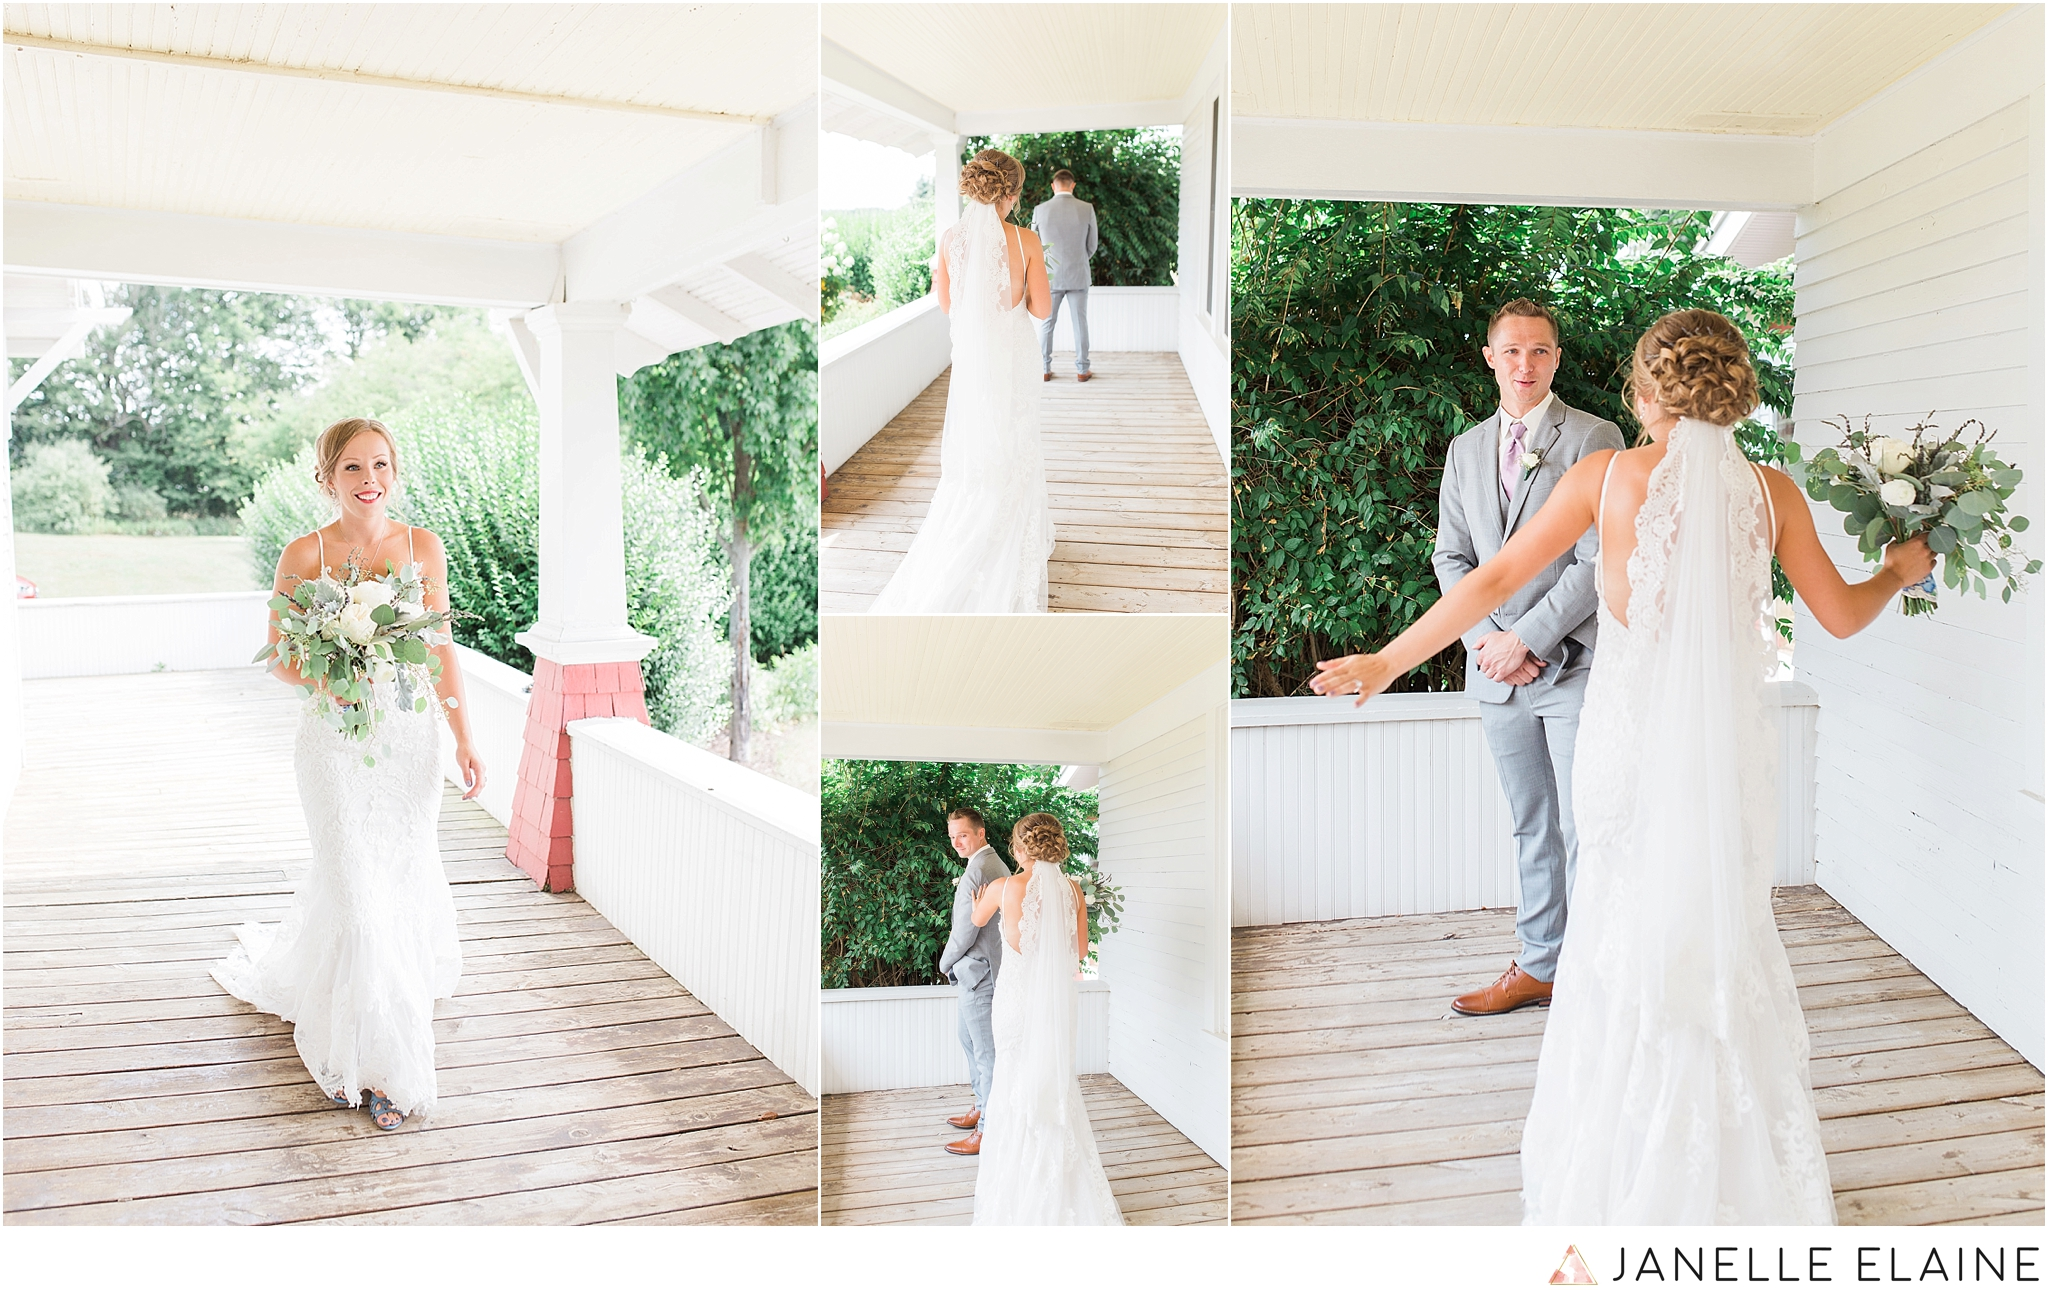 warnsholz-wedding-michigan-photography-janelle elaine photography-71.jpg